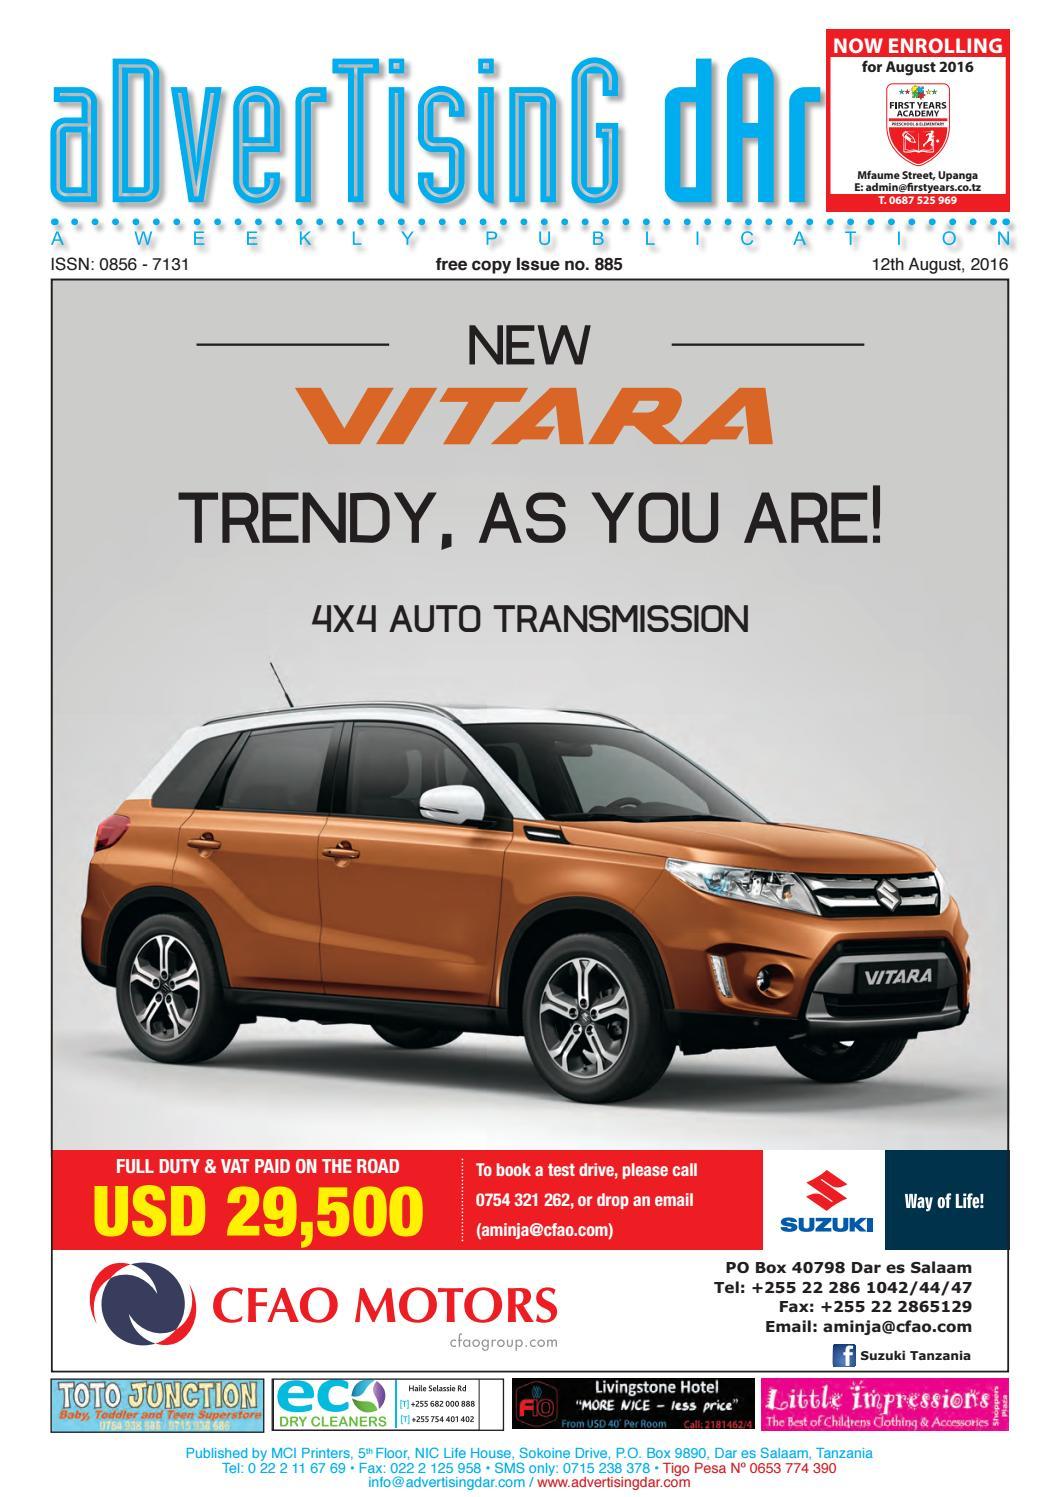 Advertising Dar Issue Nº 885 - 12th August 2016 by Advertising Dar ... d6b4bfb2f3